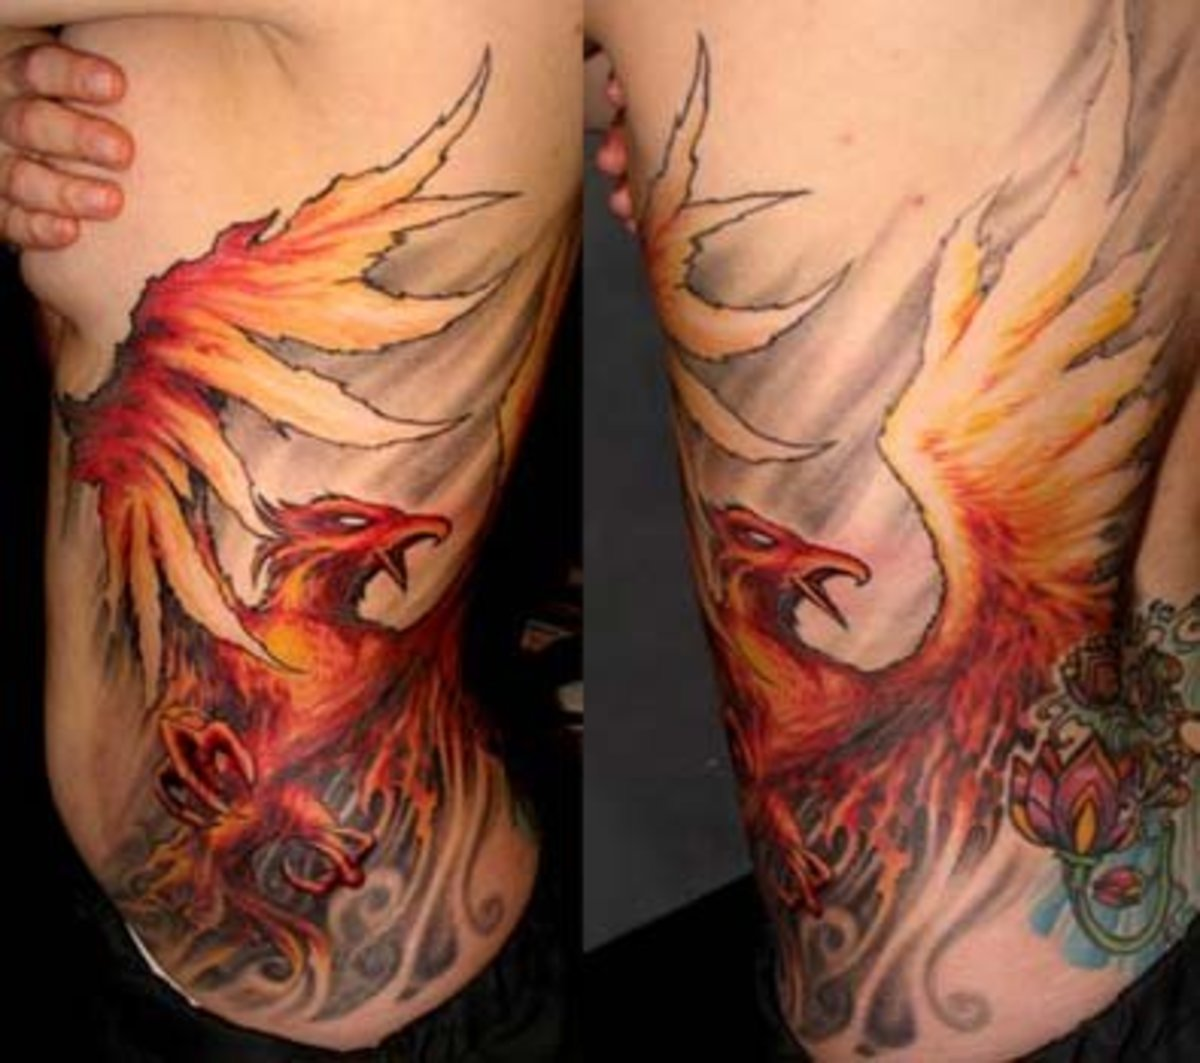 Rebirth and the Phoenix Tattoo